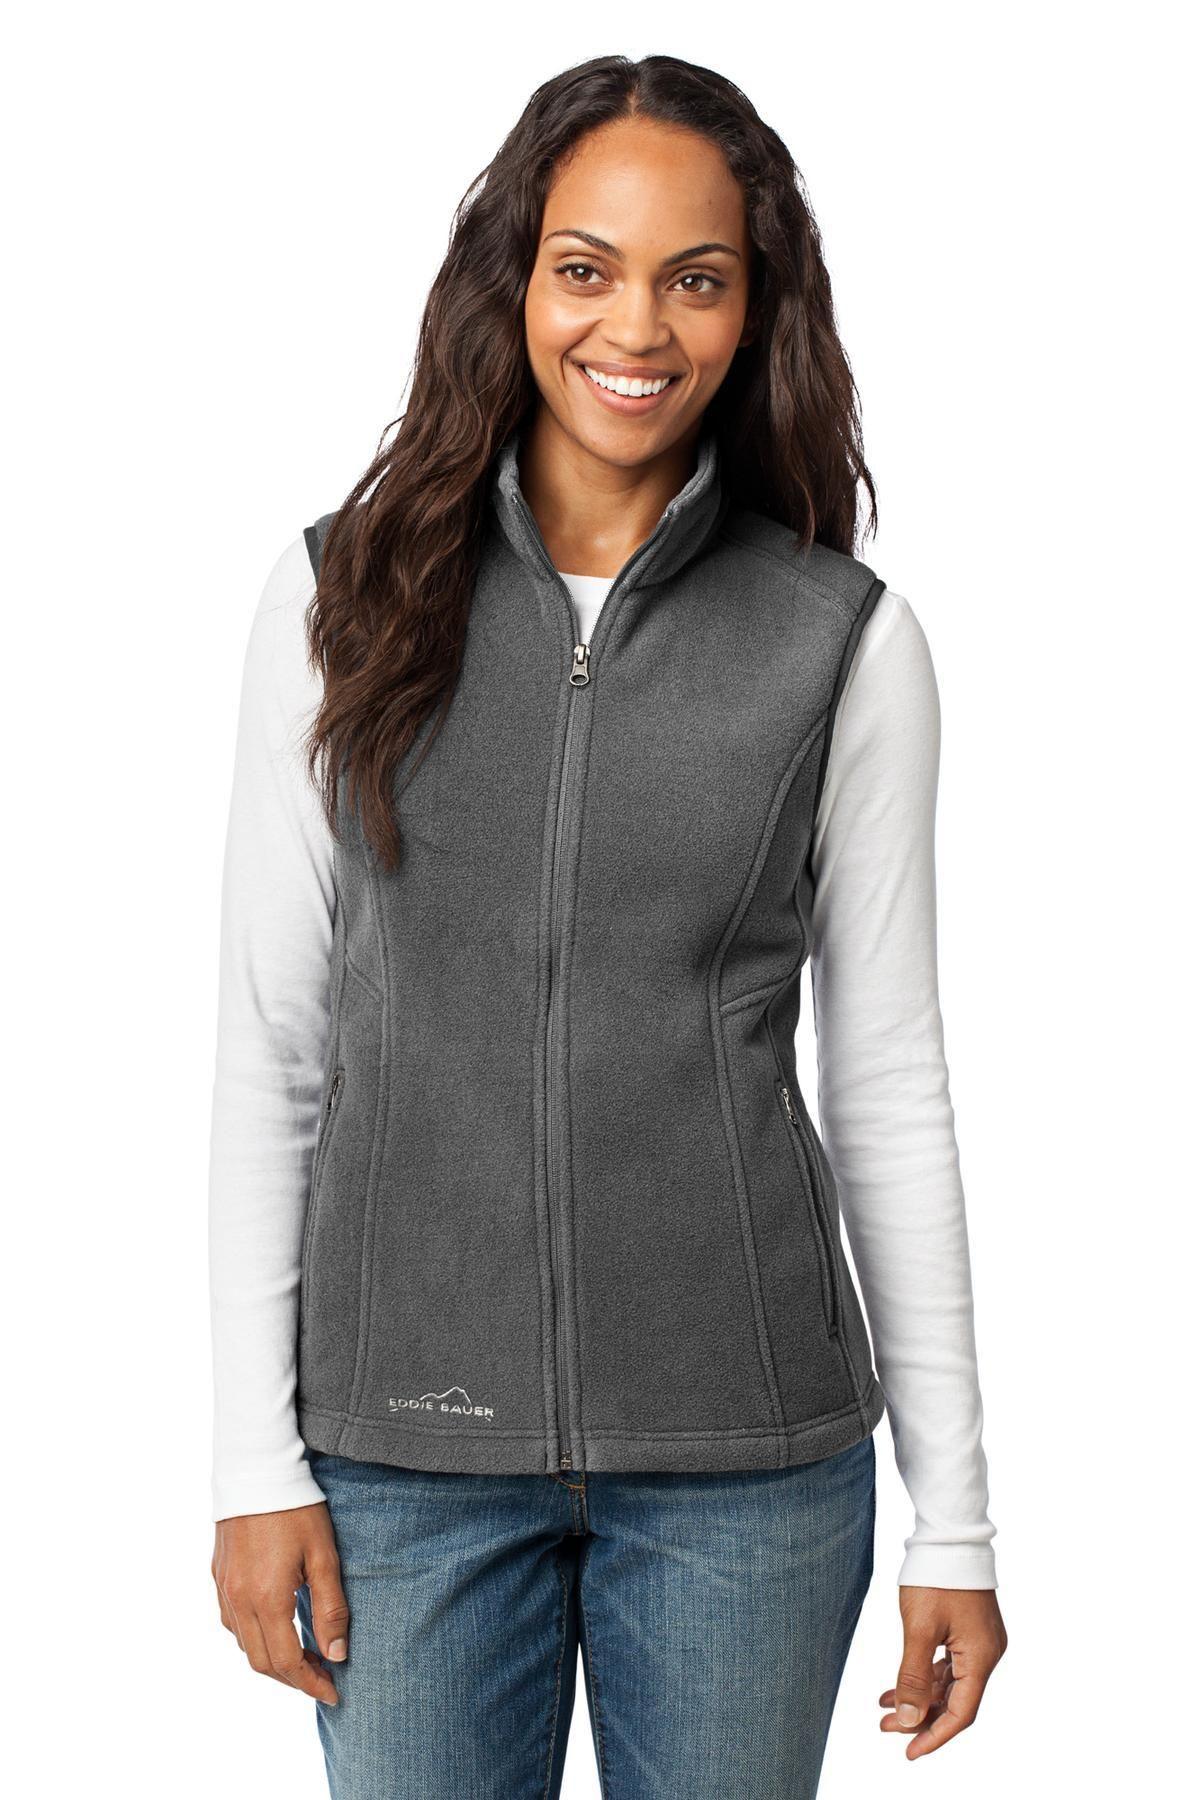 d22dc164919 Eddie Bauer - Ladies Fleece Vest EB205 Grey Steel in 2018